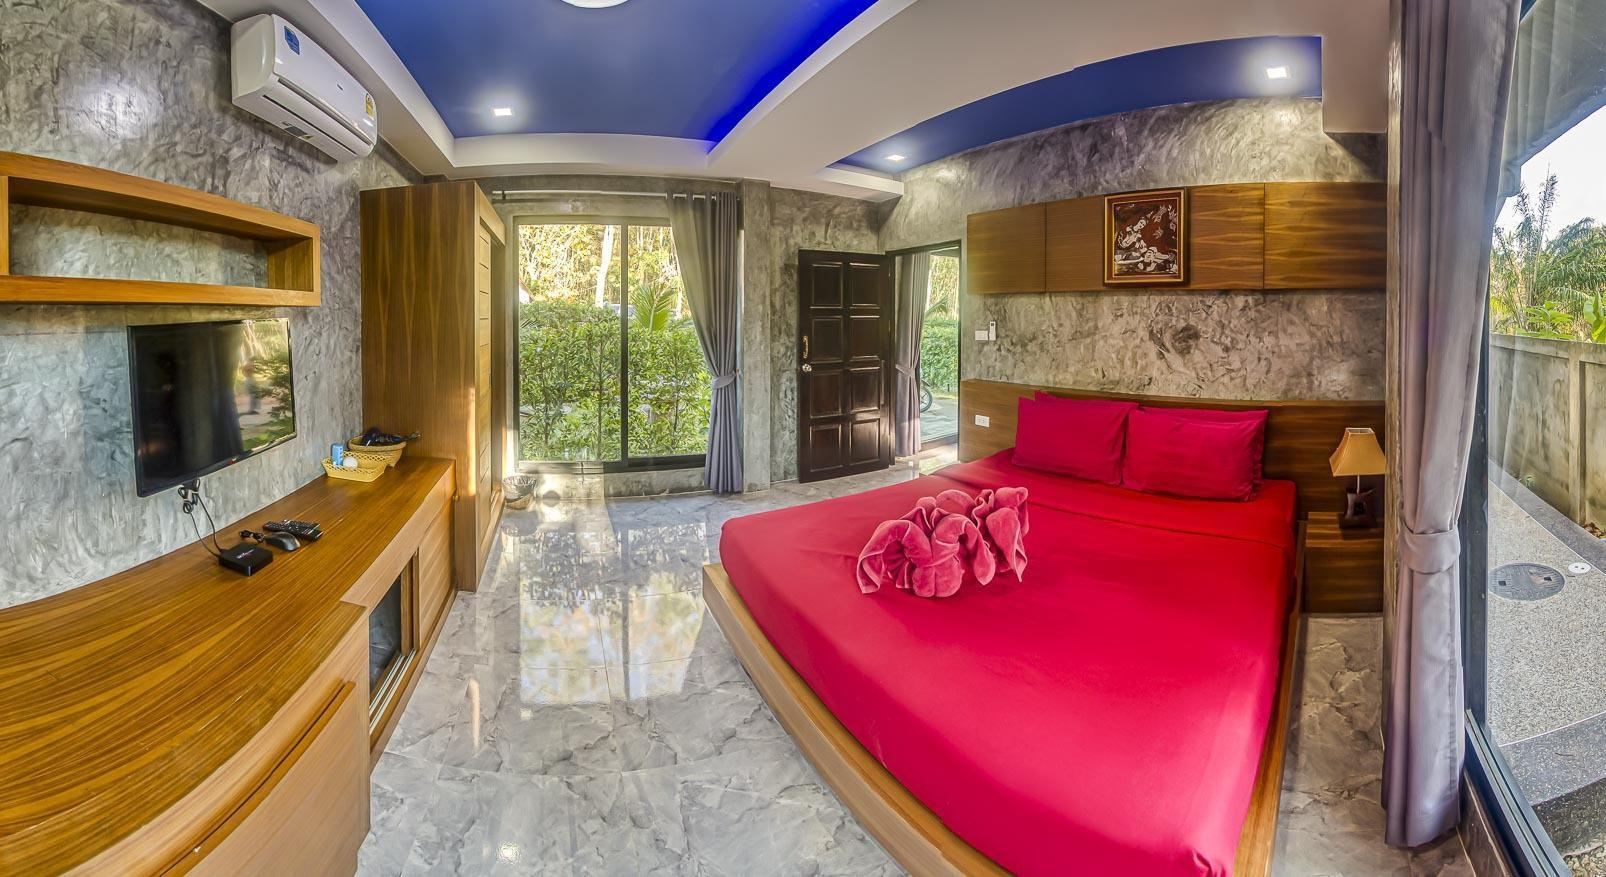 Lanta K Home , Deluxe Room With Kitchen 1 ห้องนอน 1 ห้องน้ำส่วนตัว ขนาด 30 ตร.ม. – หาดคลองนิน